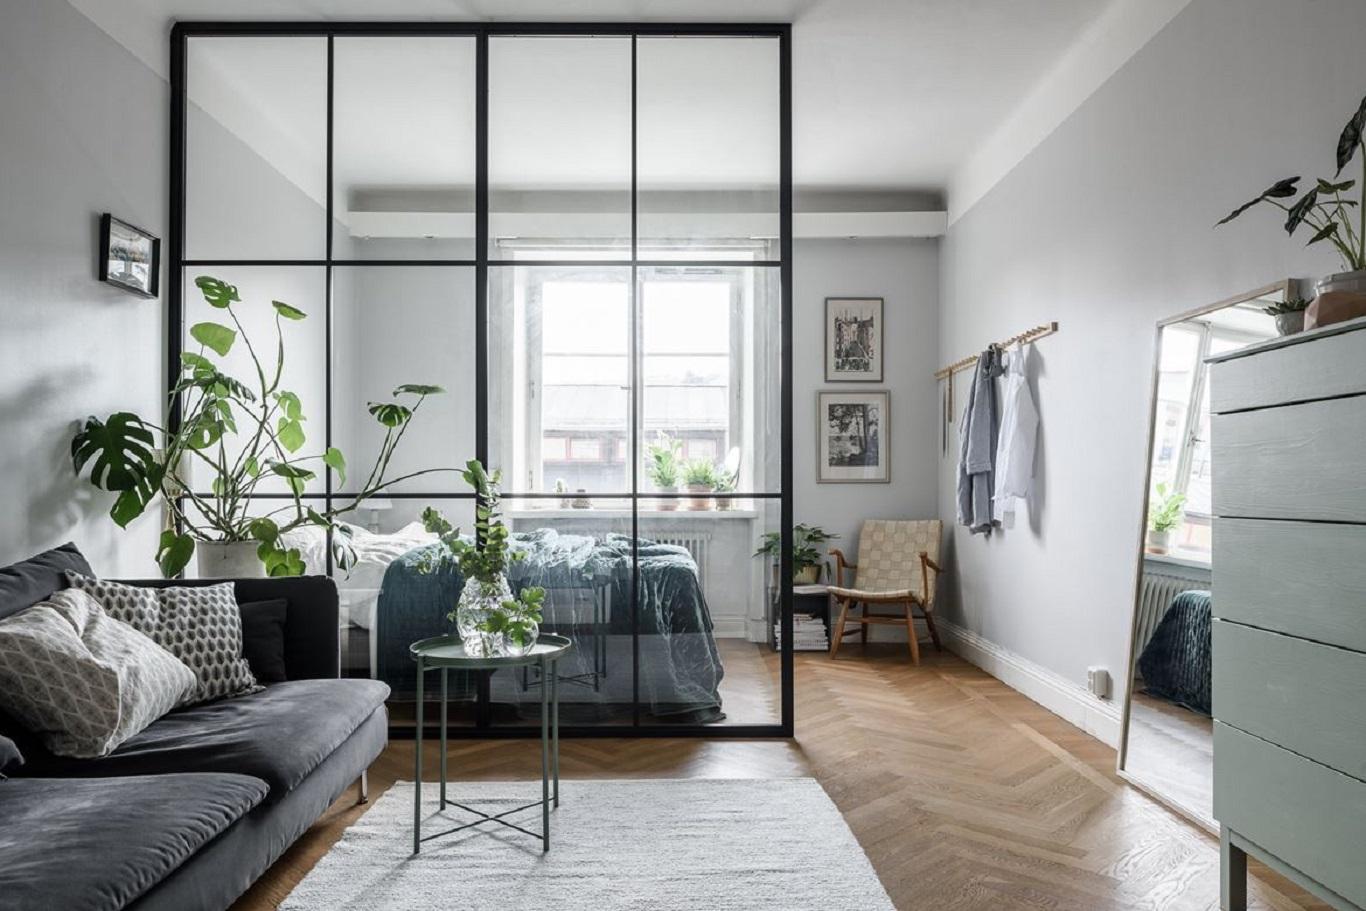 Dove gray walls, herringbone wood flooring, and tapered legged furniture speaks of cool Nordic styling